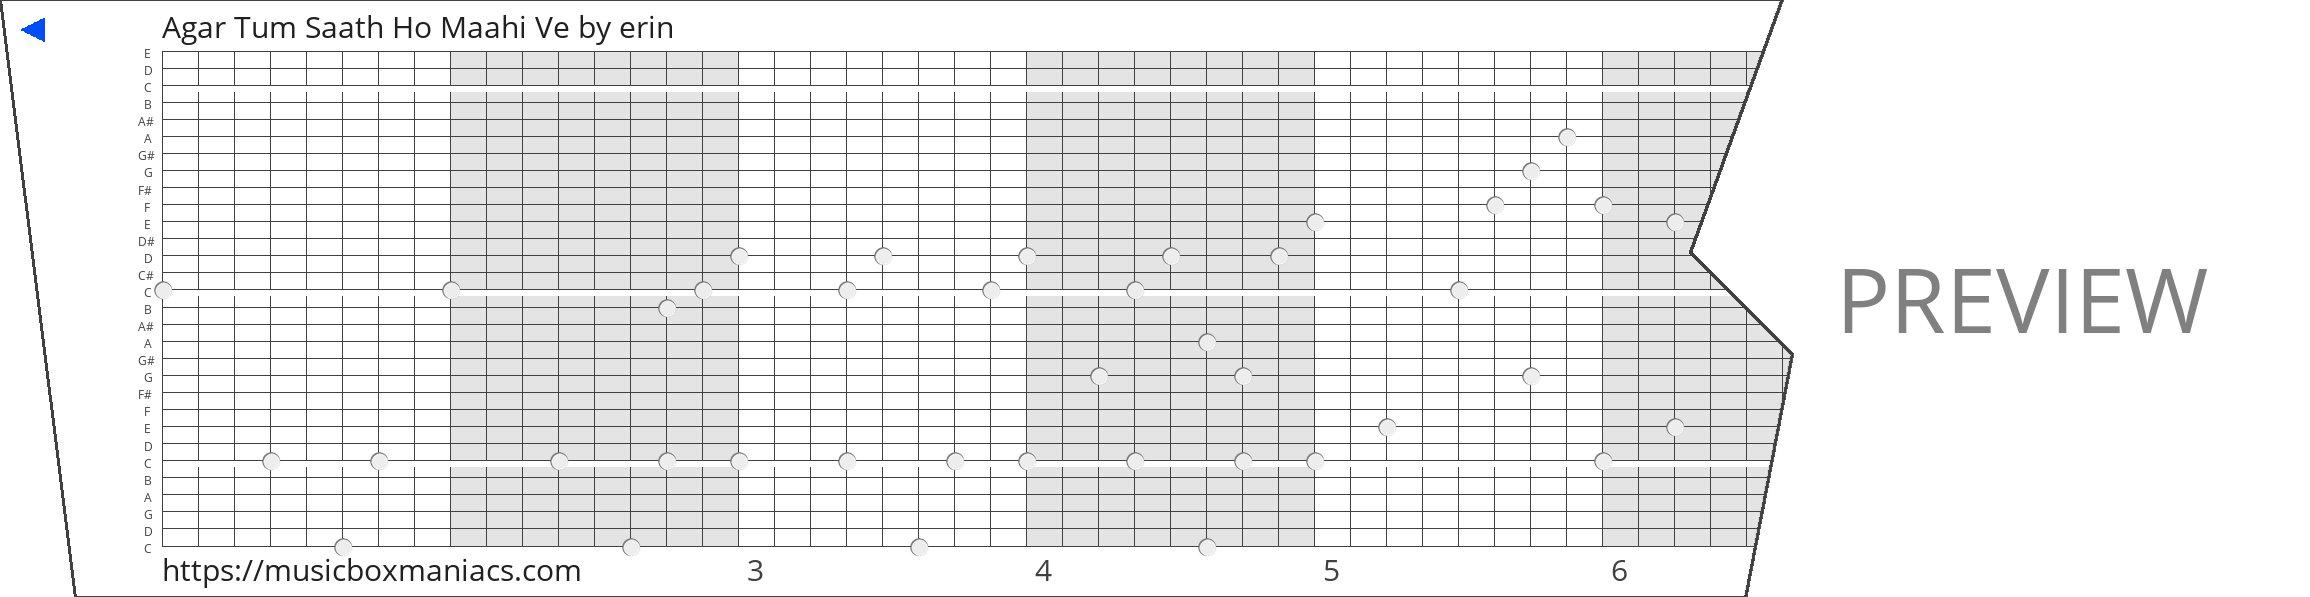 Agar Tum Saath Ho Maahi Ve 30 note music box paper strip